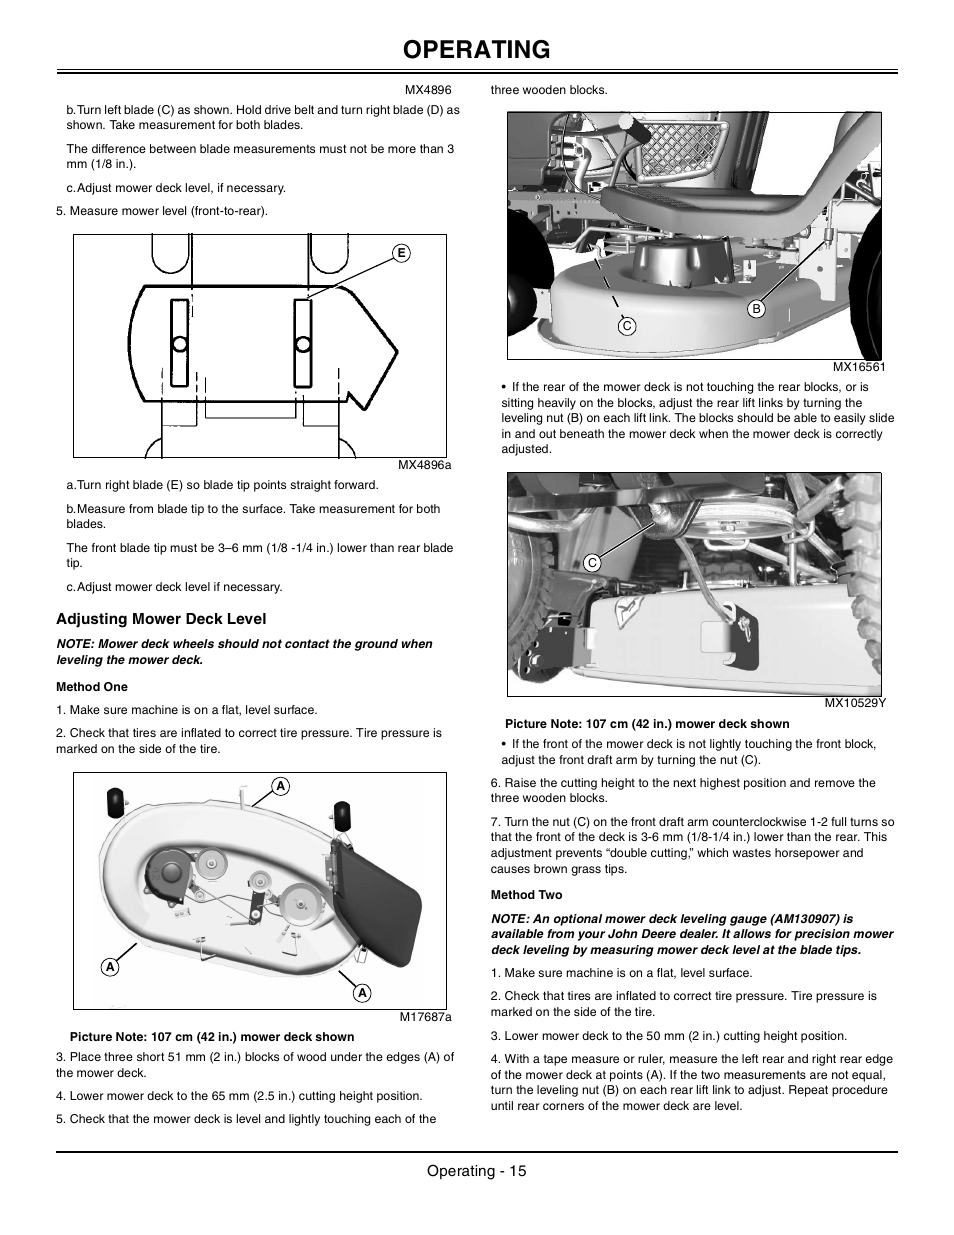 Adjusting Mower Deck Level Method One Two John Deere La105 User Manual Page 16 52